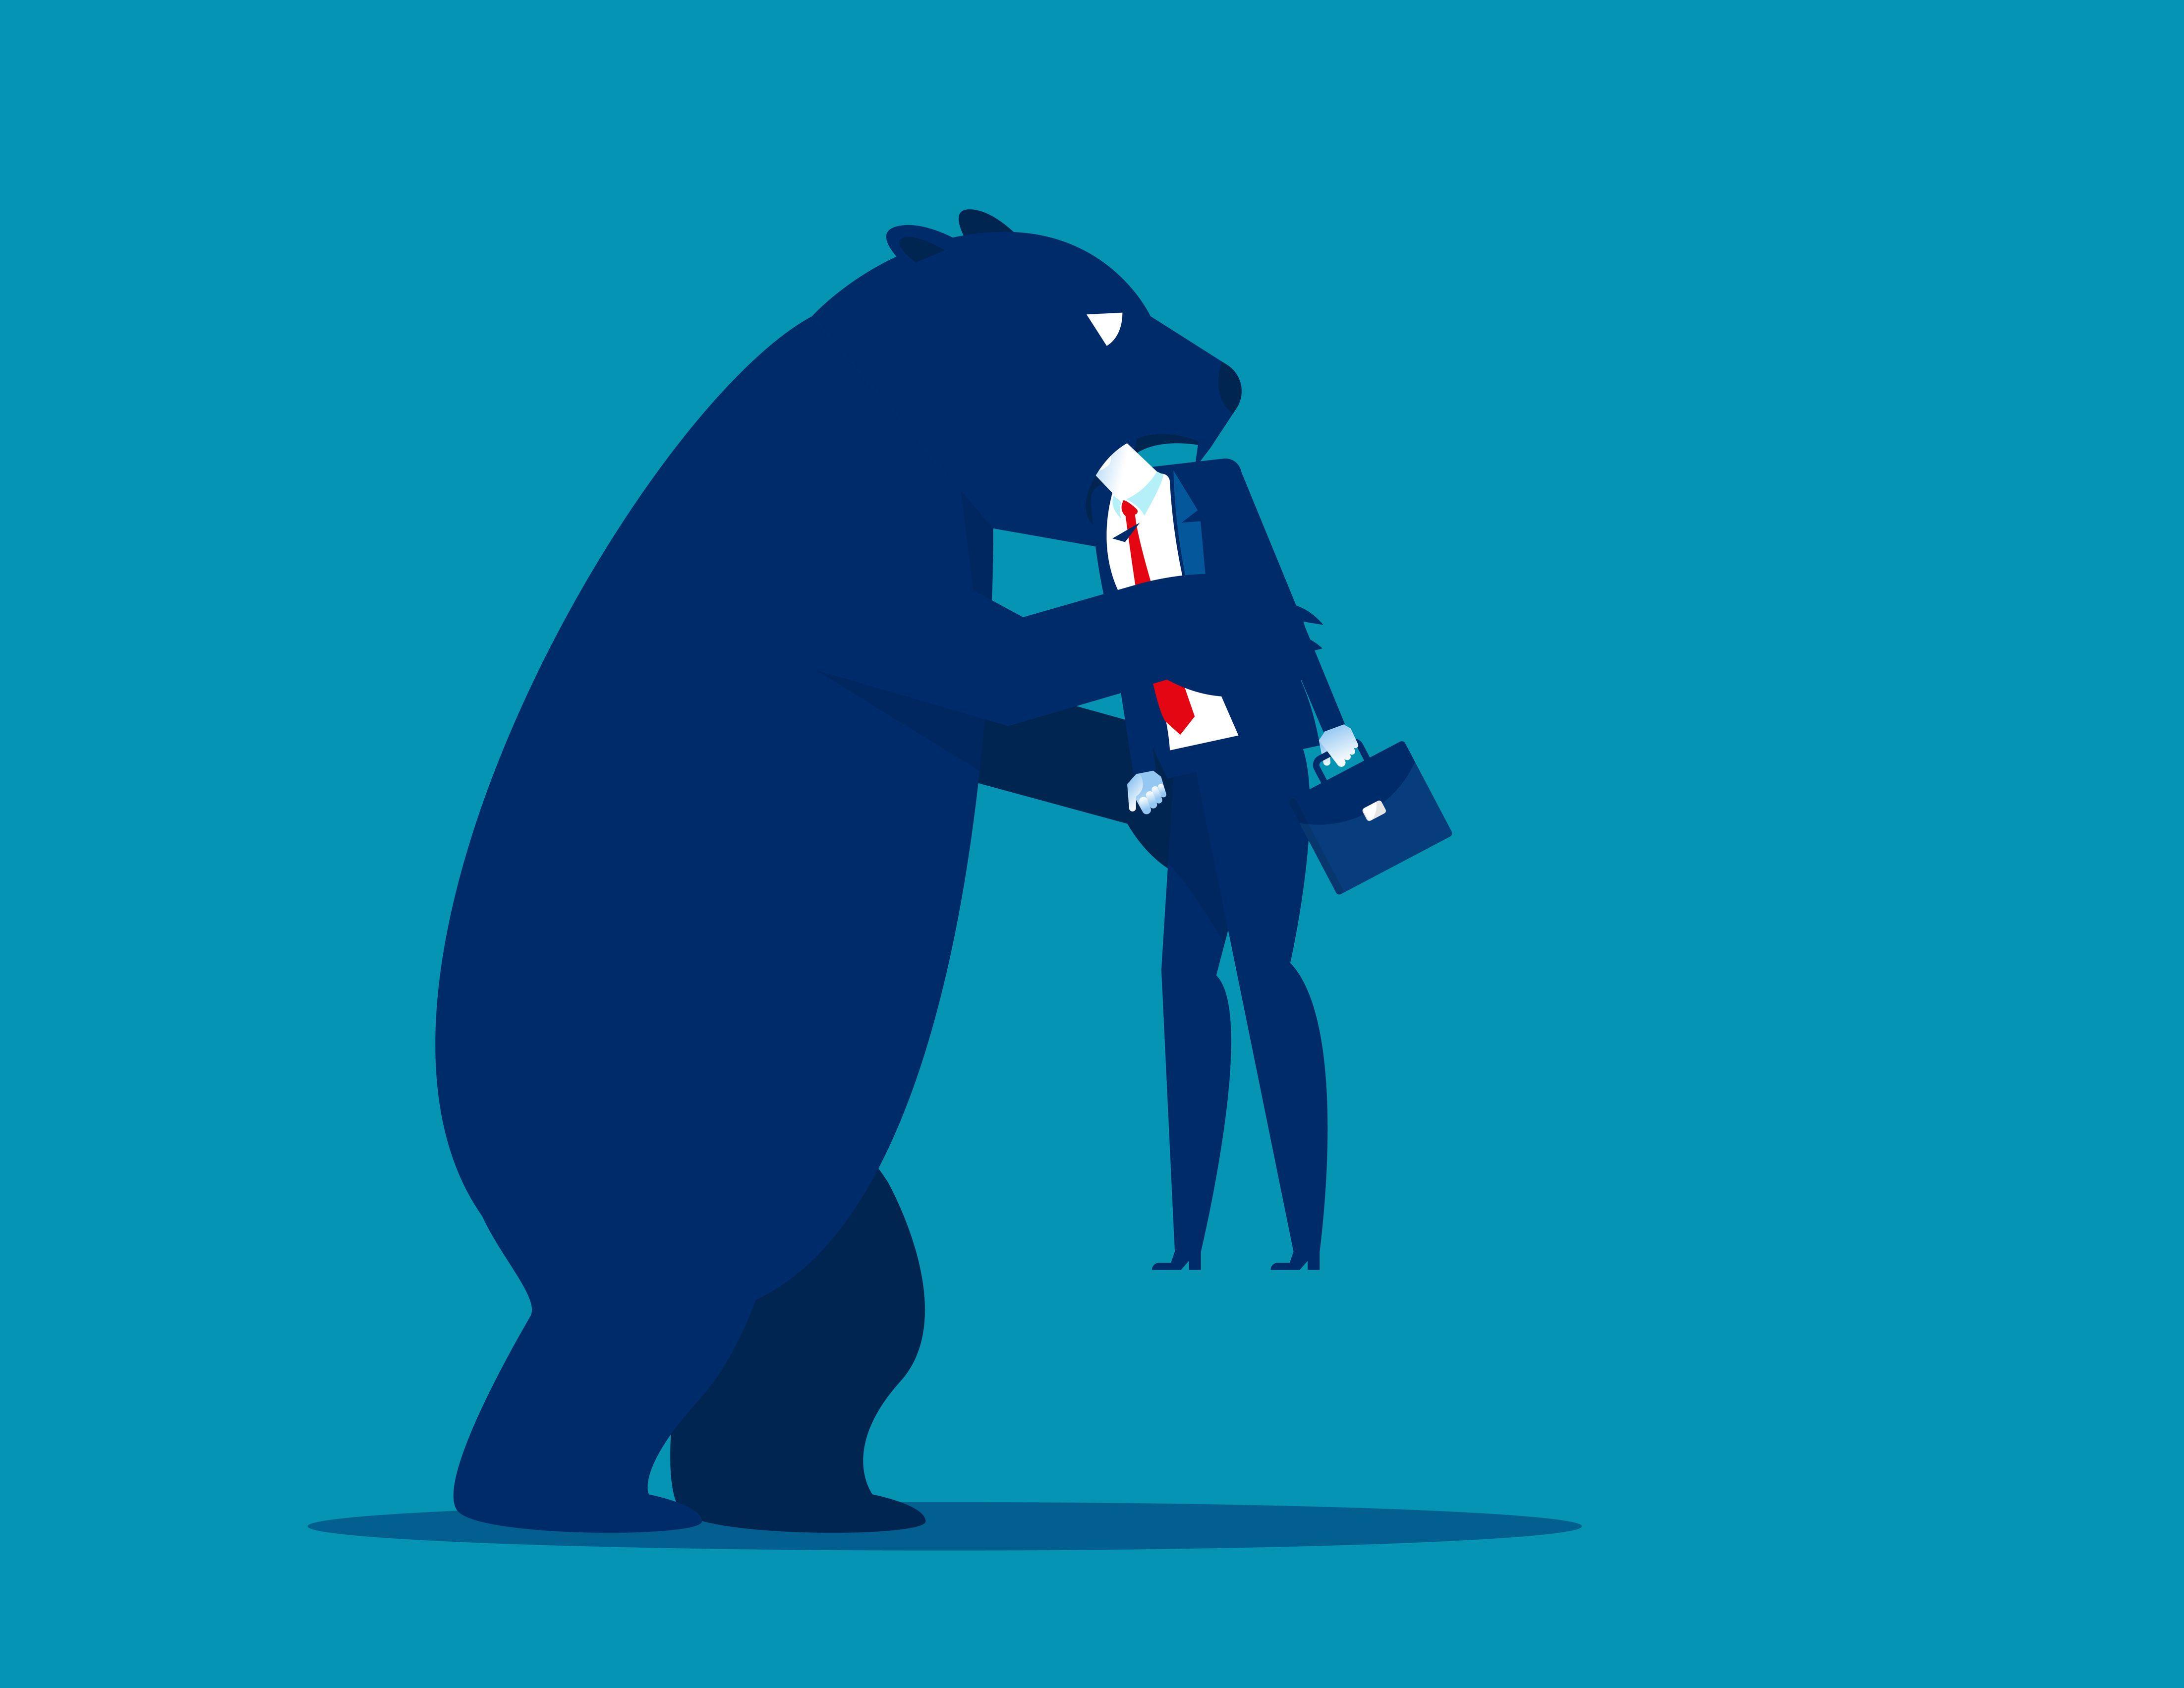 /bitcoin-bear-market-already-9tt32zm feature image